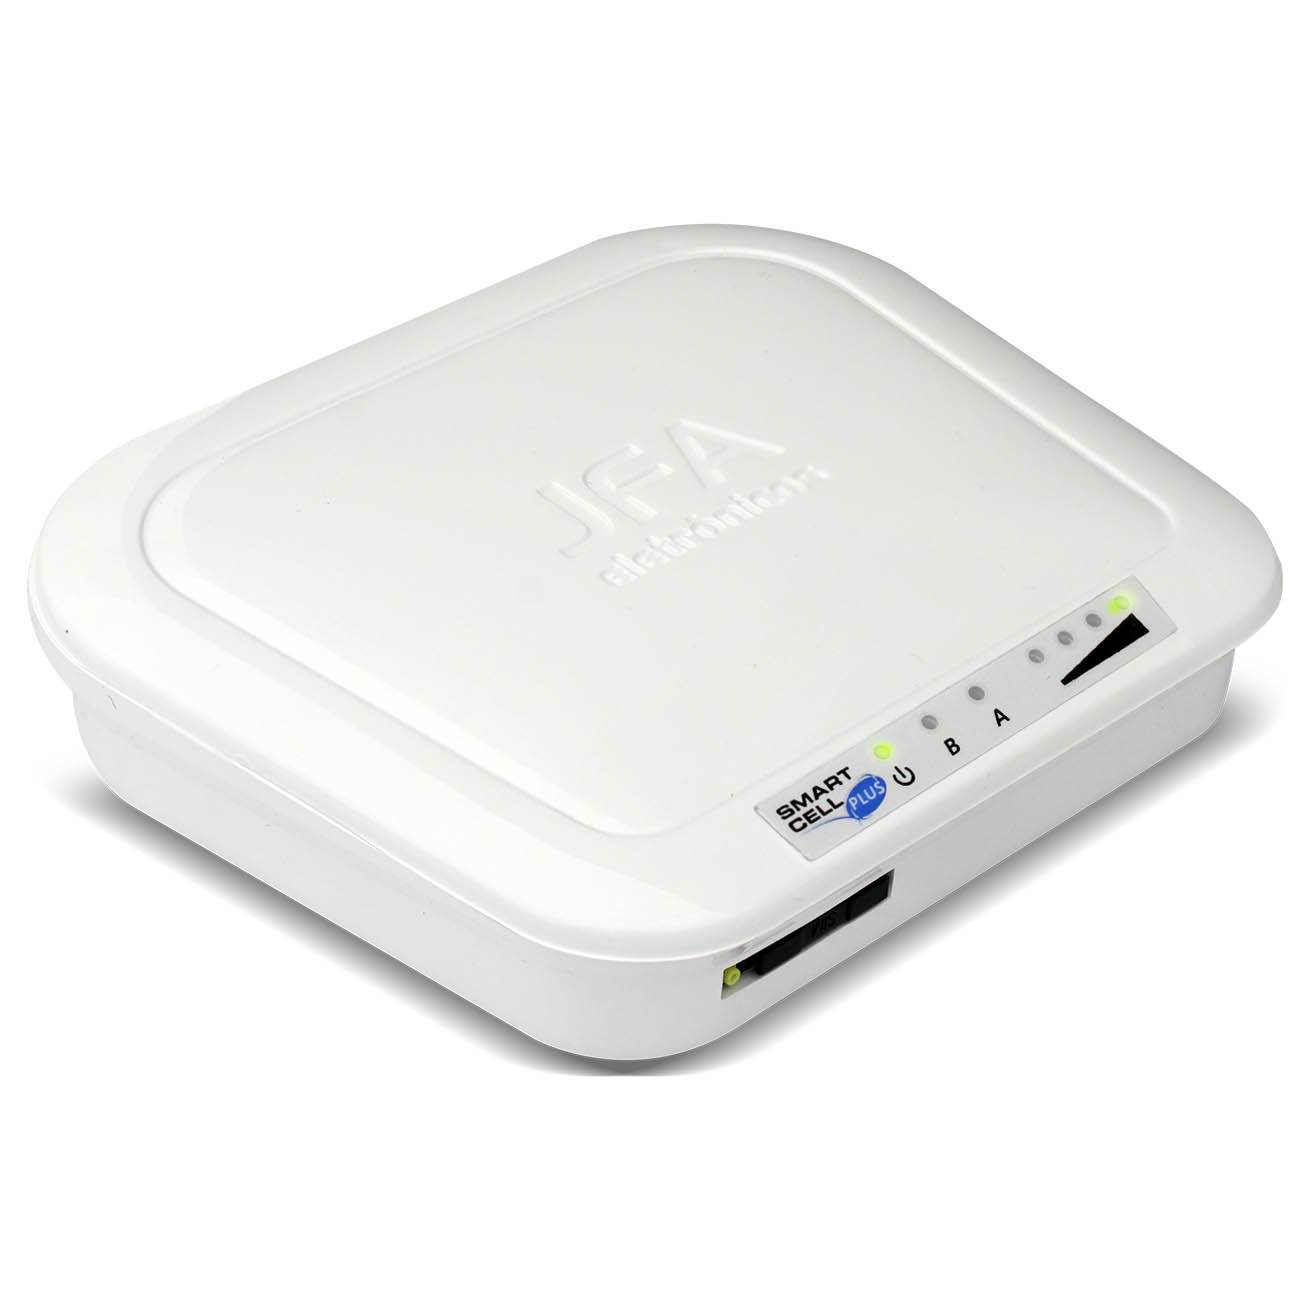 Interface Rural JFA Smart Cell Plus Telefone Celular Fixo PABX Modulo GSM Quadri - Band